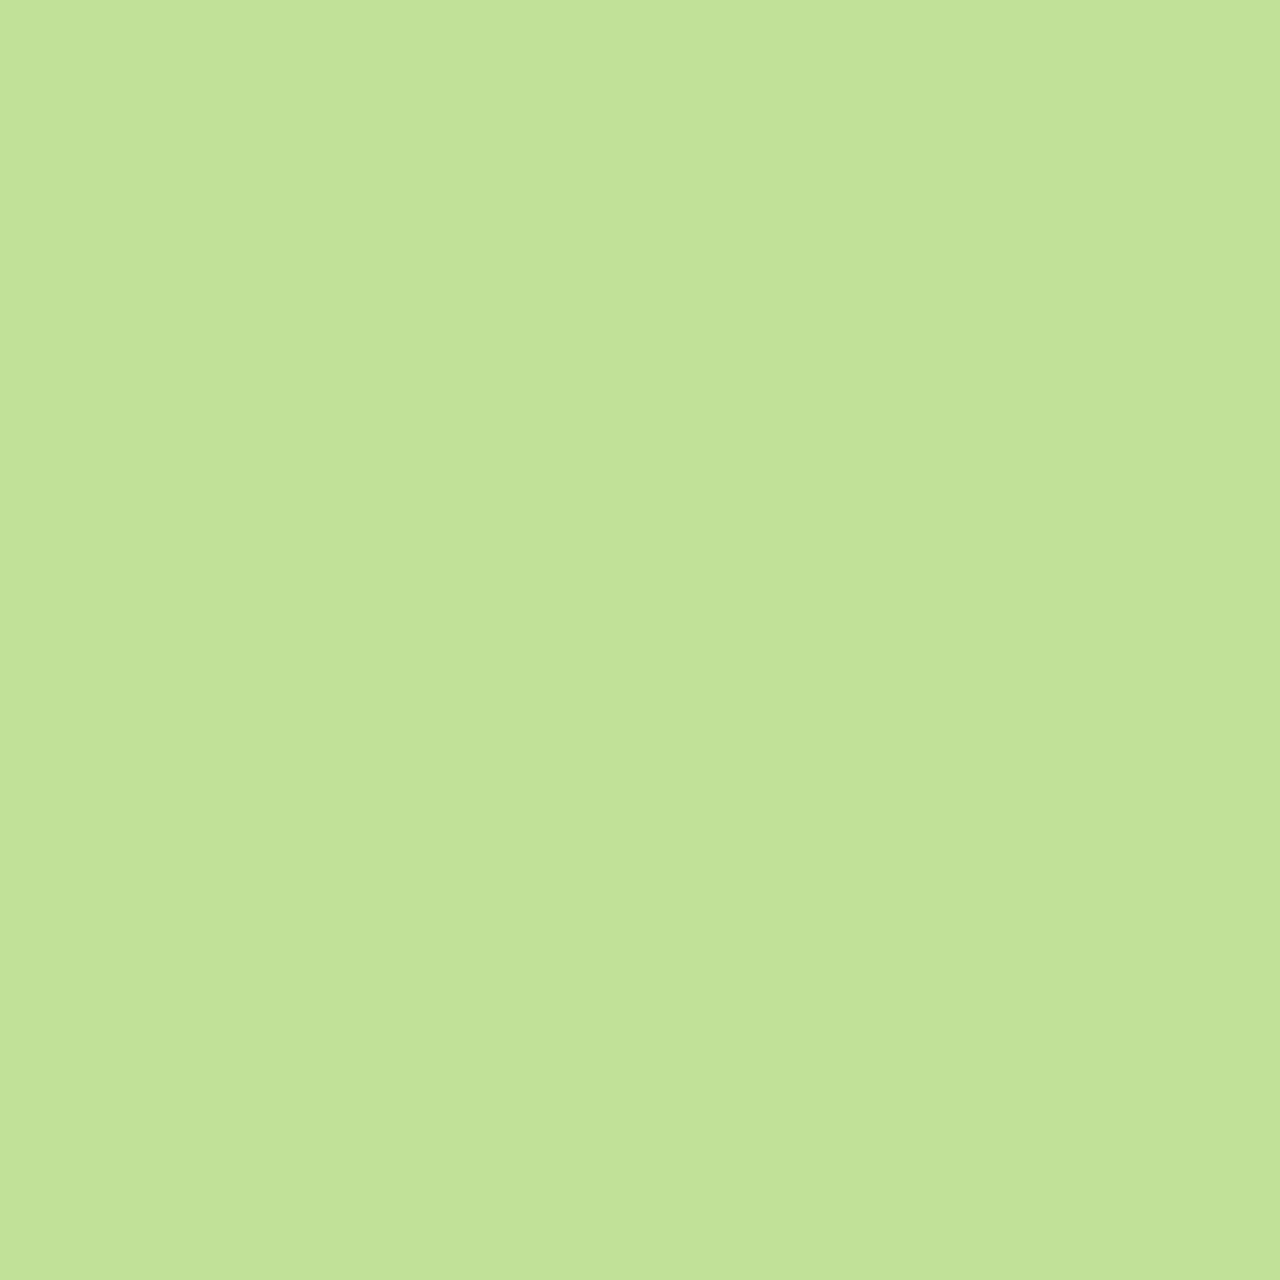 Rosco Cinegel Sheet #3304: Tough Plusgreen/Windowgreen, Gels